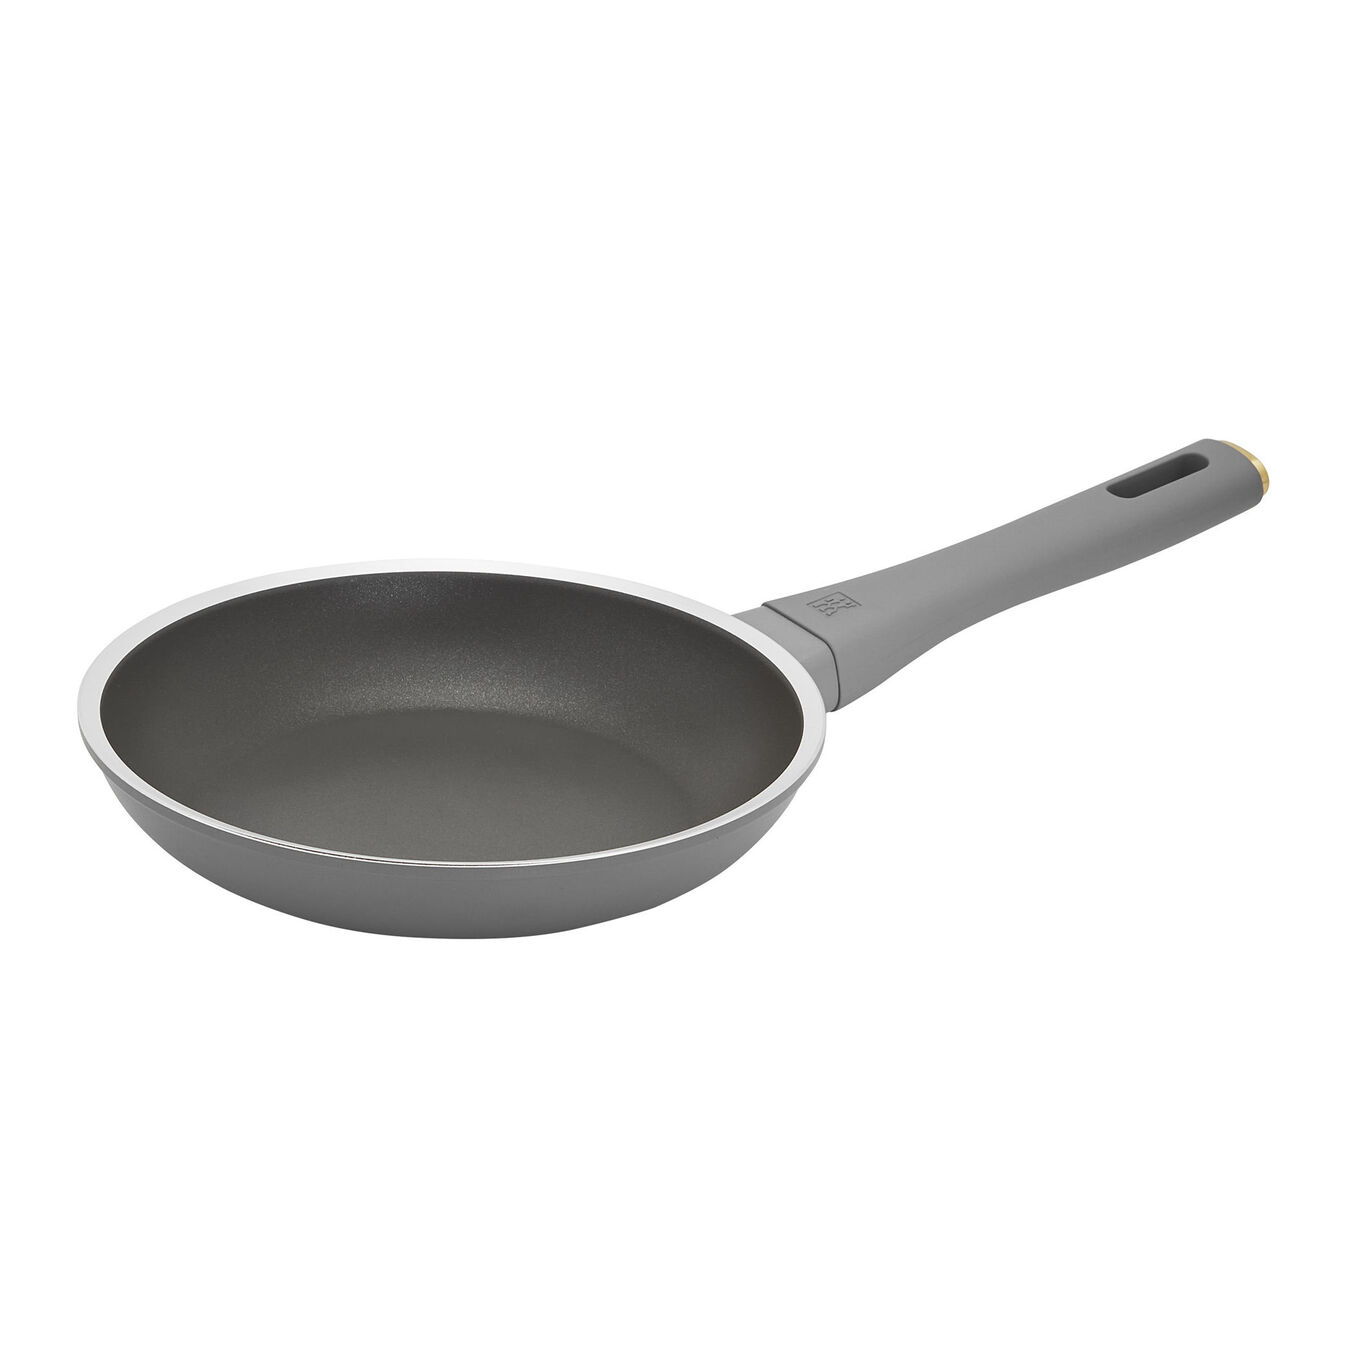 8-inch, Aluminium, Non-stick, Frying pan,,large 1